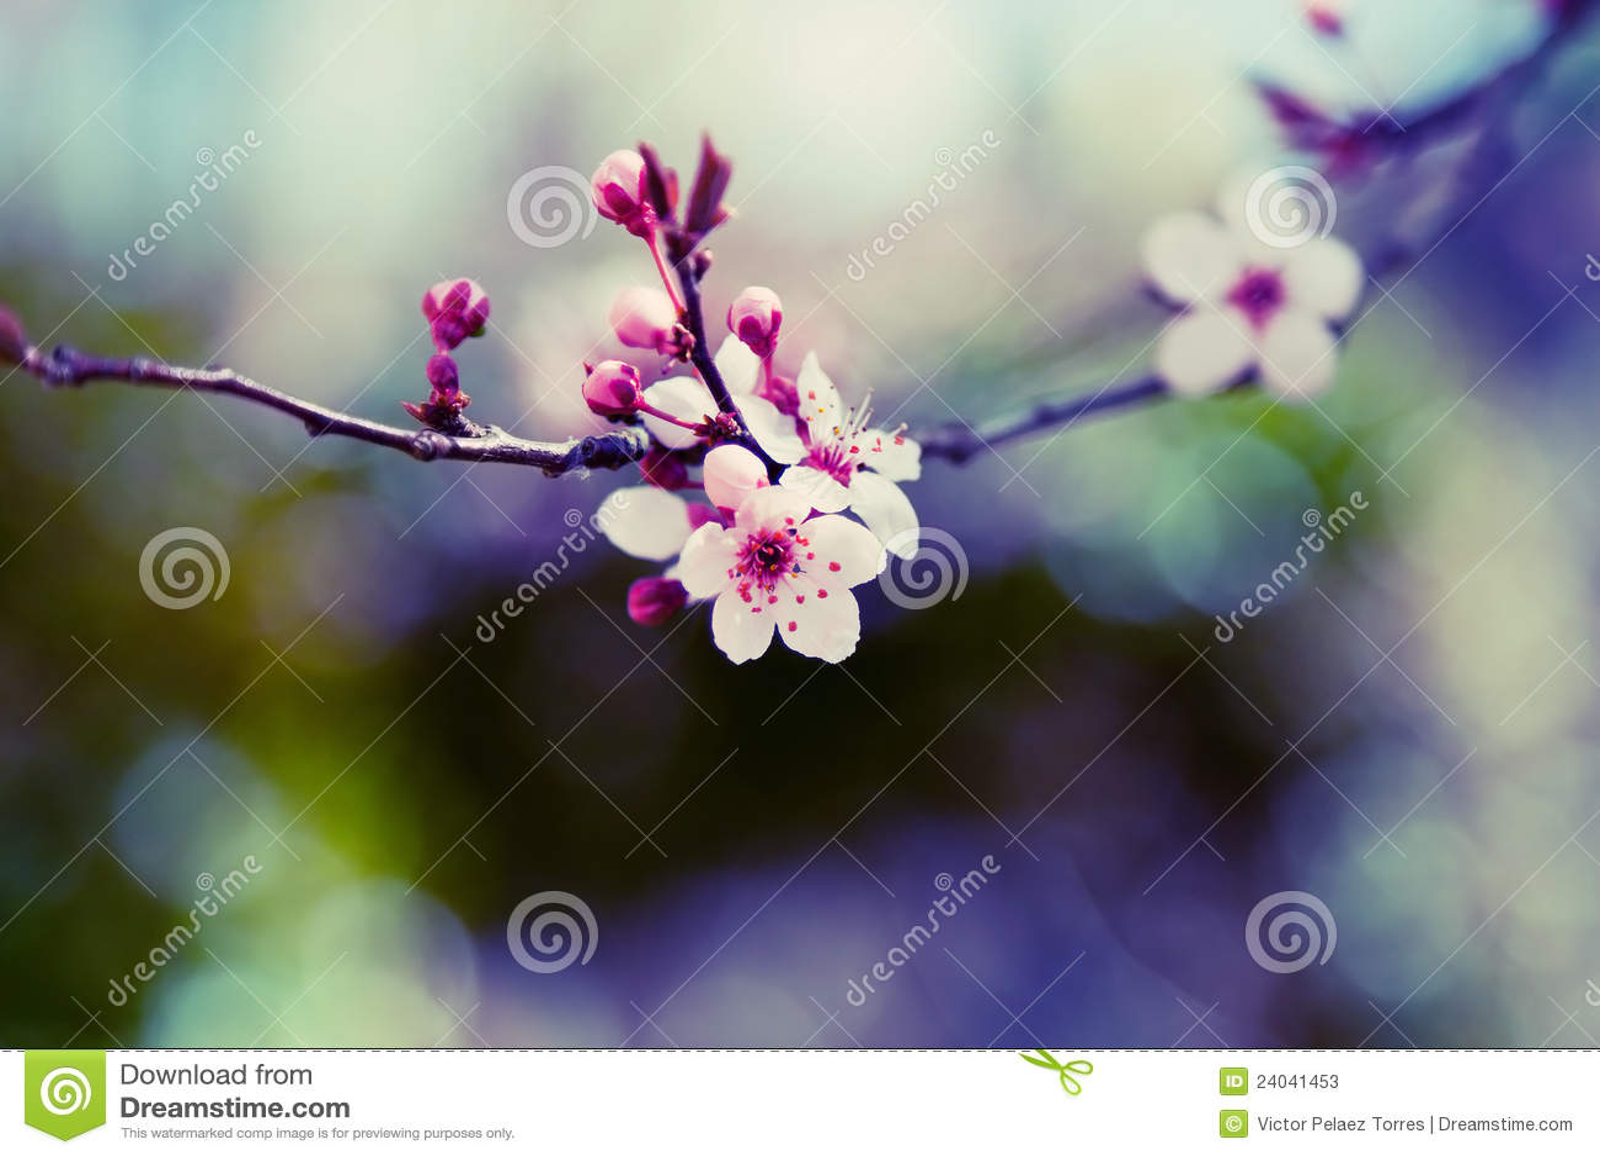 Almond Tree Flower